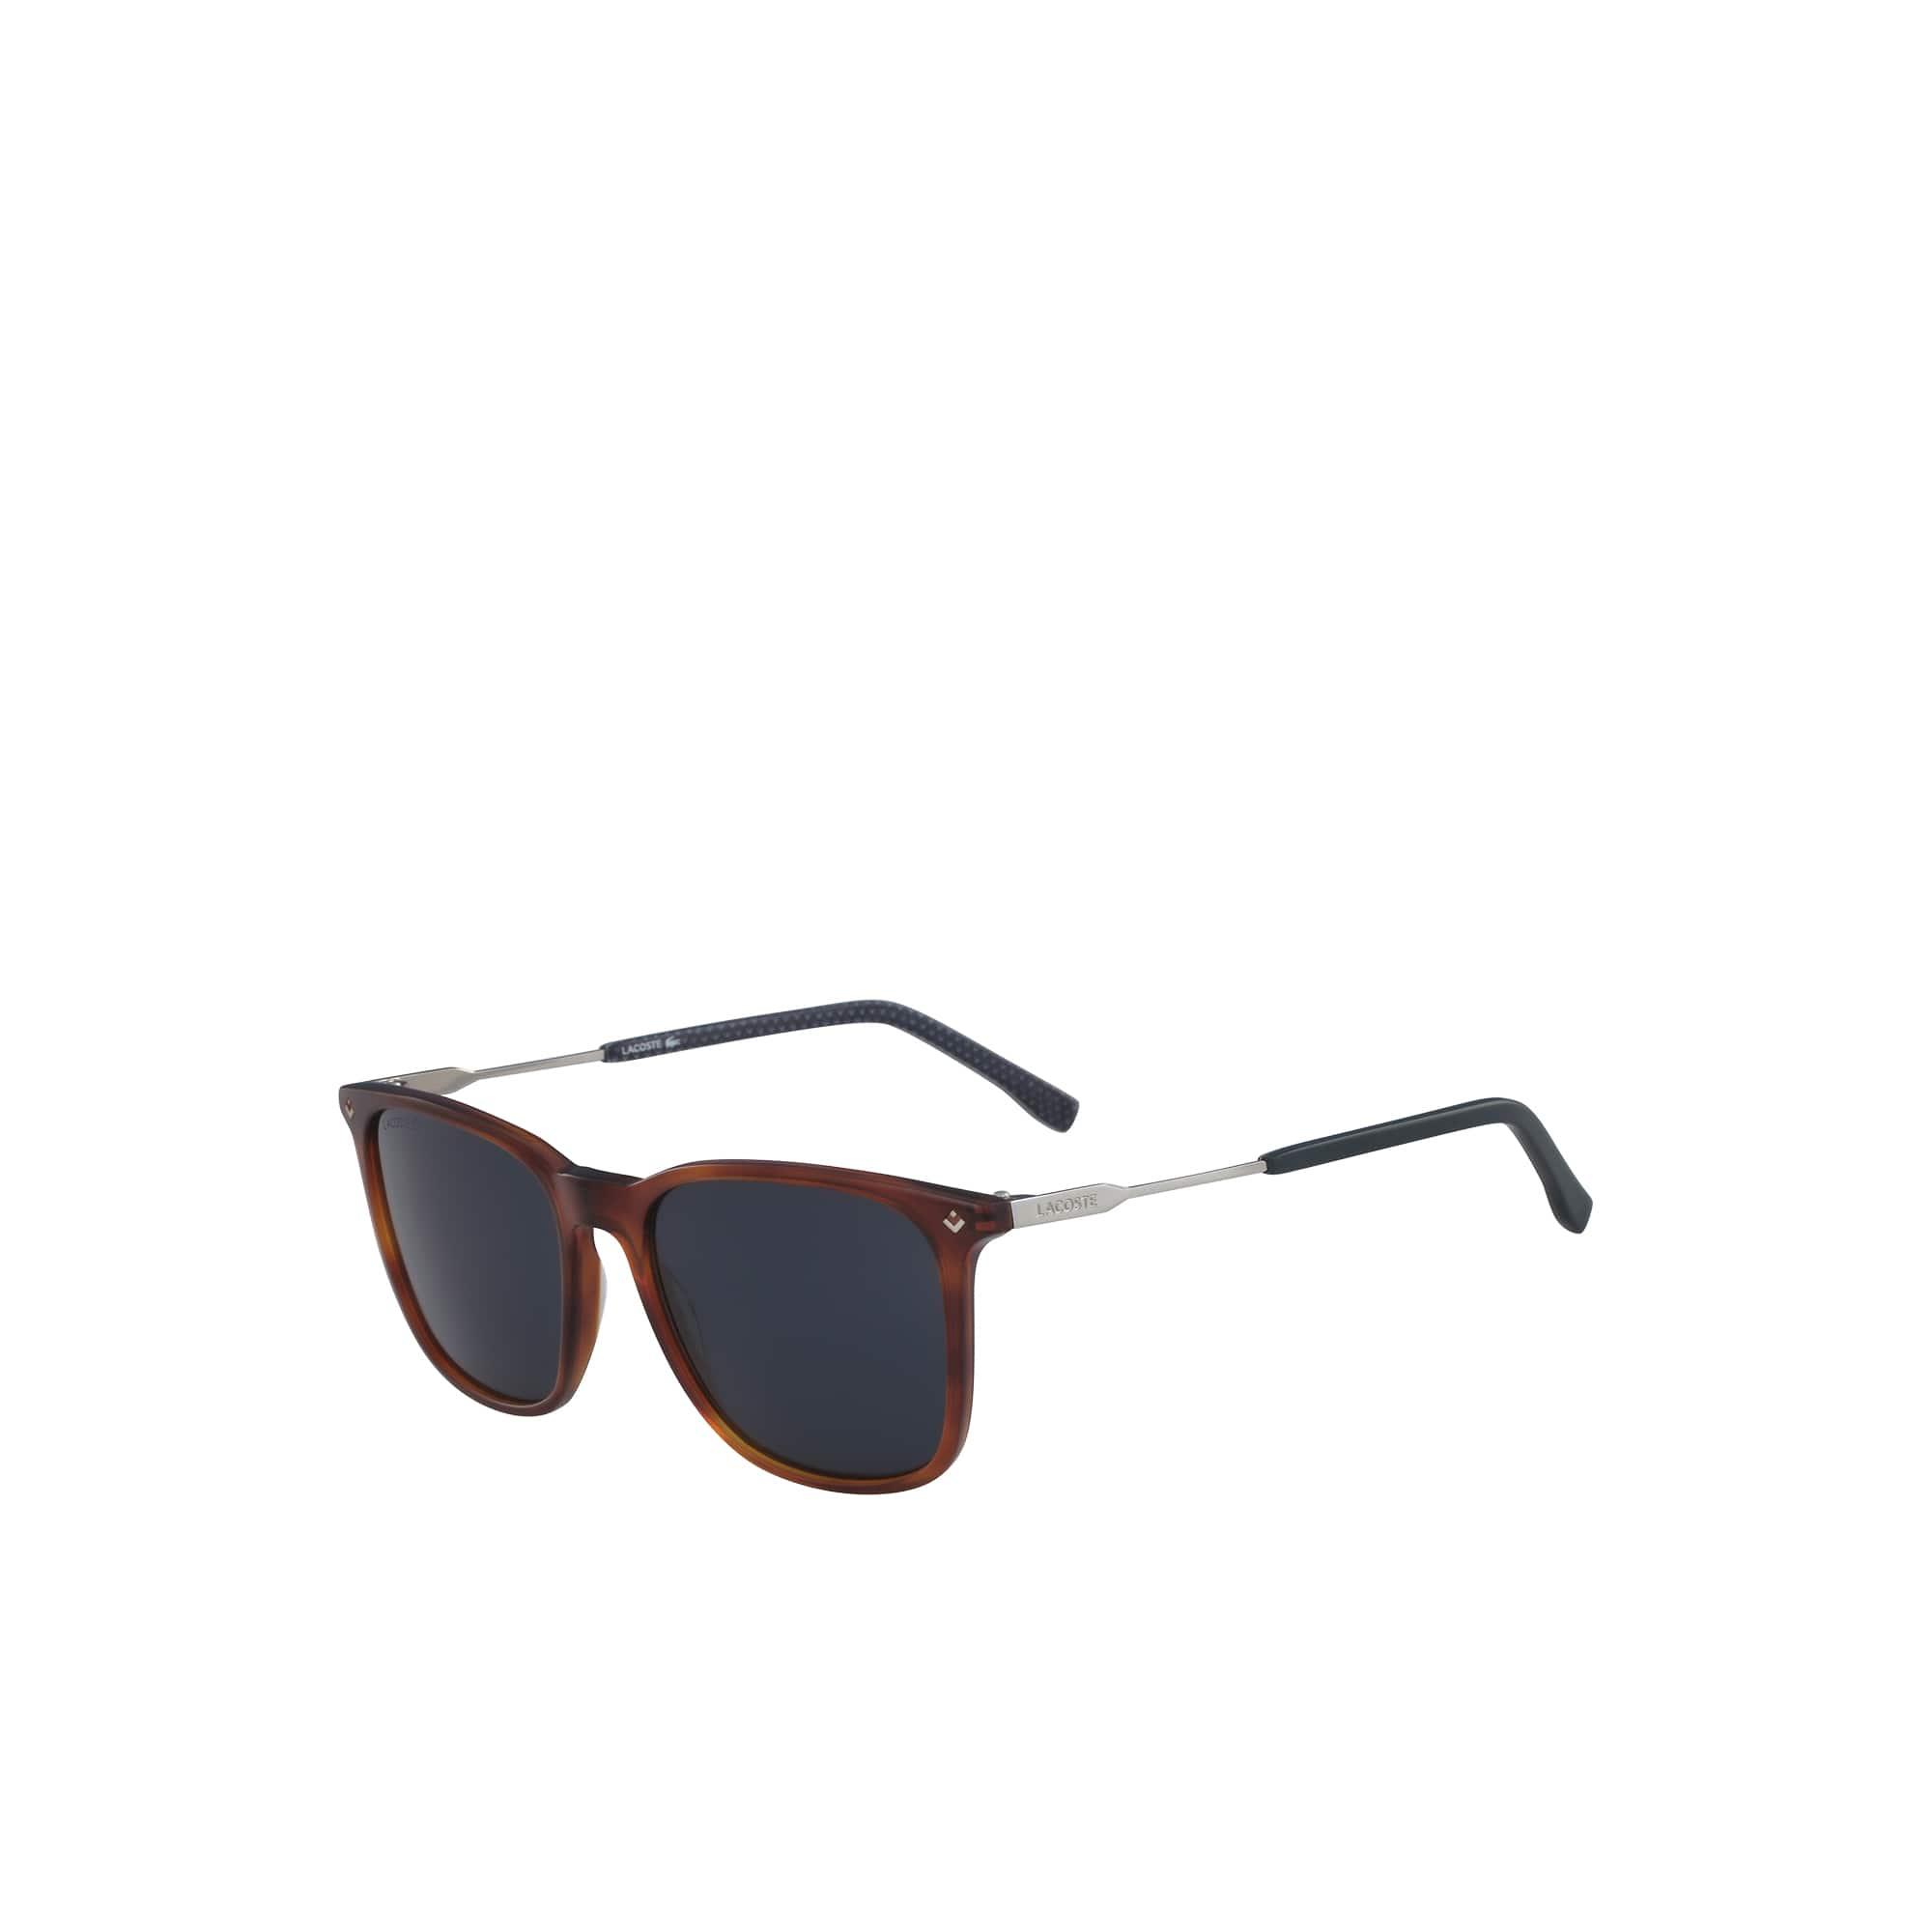 Men's Petit Piqué Sunglasses with Acetate/Metal Frames